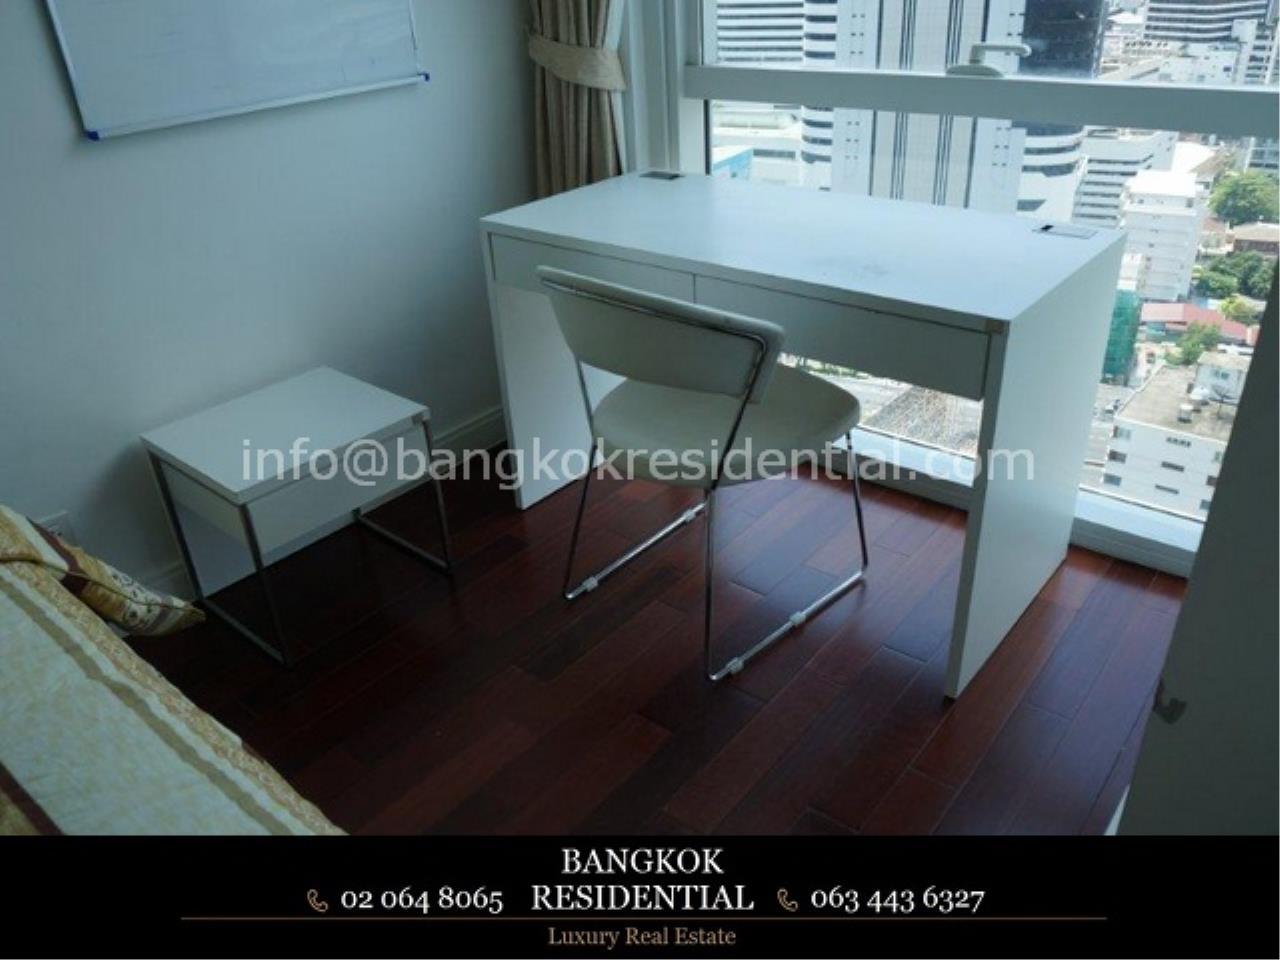 Bangkok Residential Agency's 3BR Athenee Residence For Sale Or Rent (BR3386CD) 11